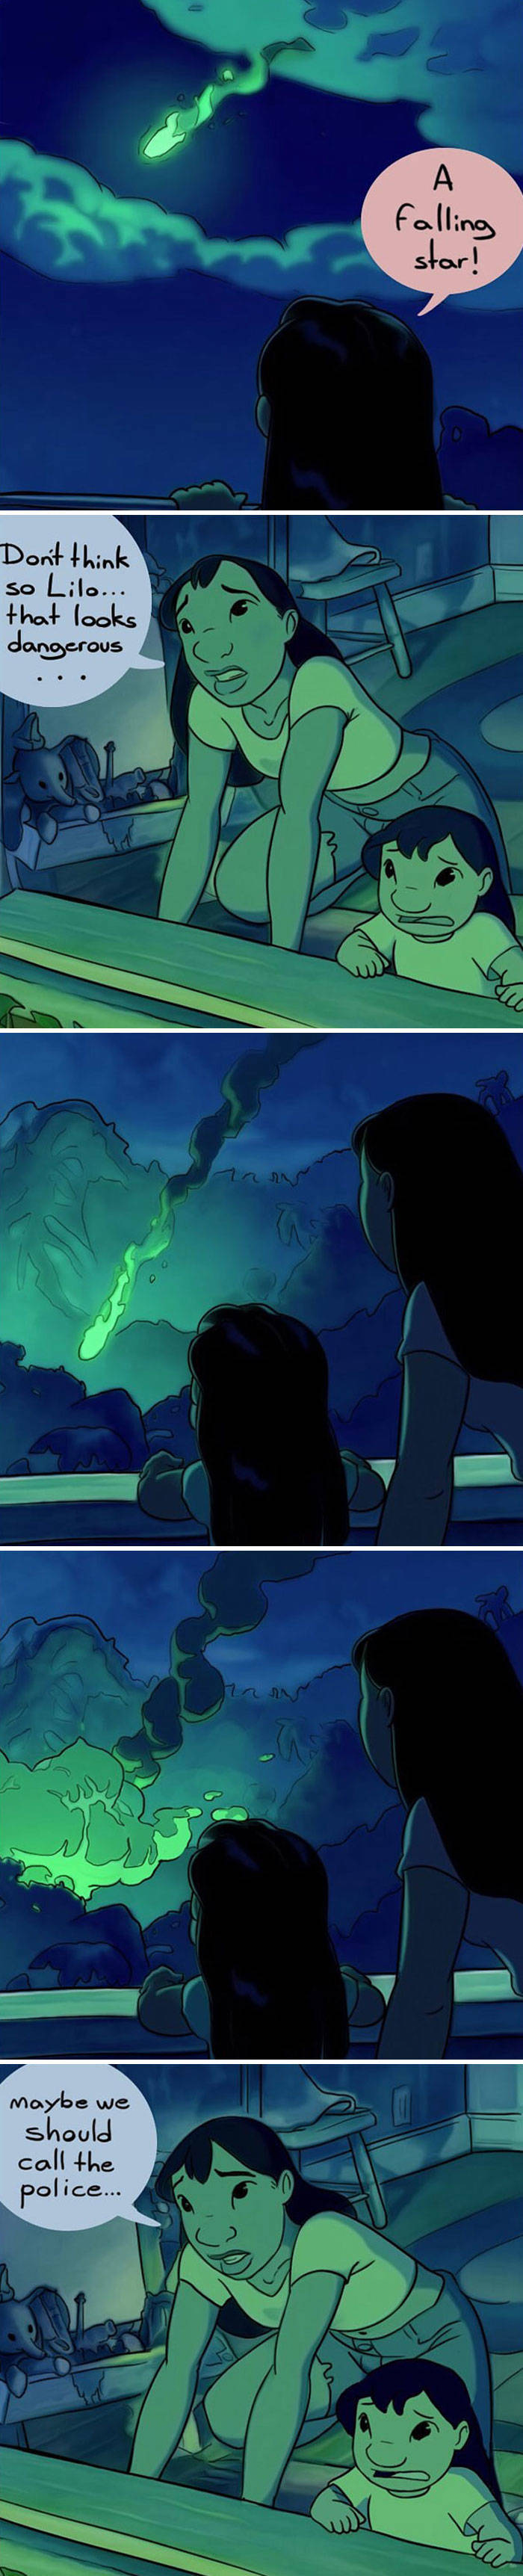 Realistic Disney Movies Would Look Very Creepy